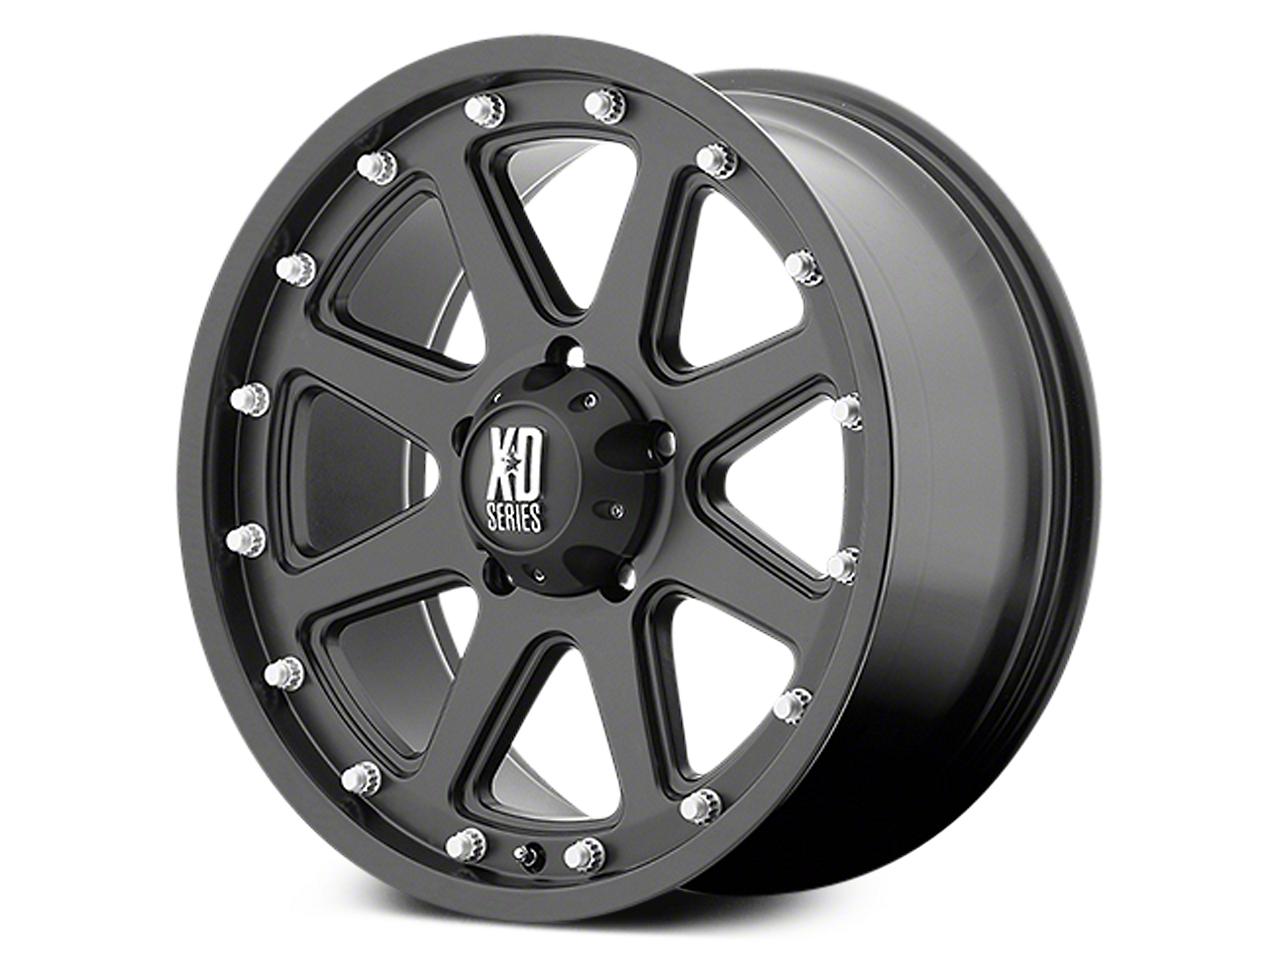 XD Addict Matte Black 6-Lug Wheel - 20x9 (07-18 Sierra 1500)